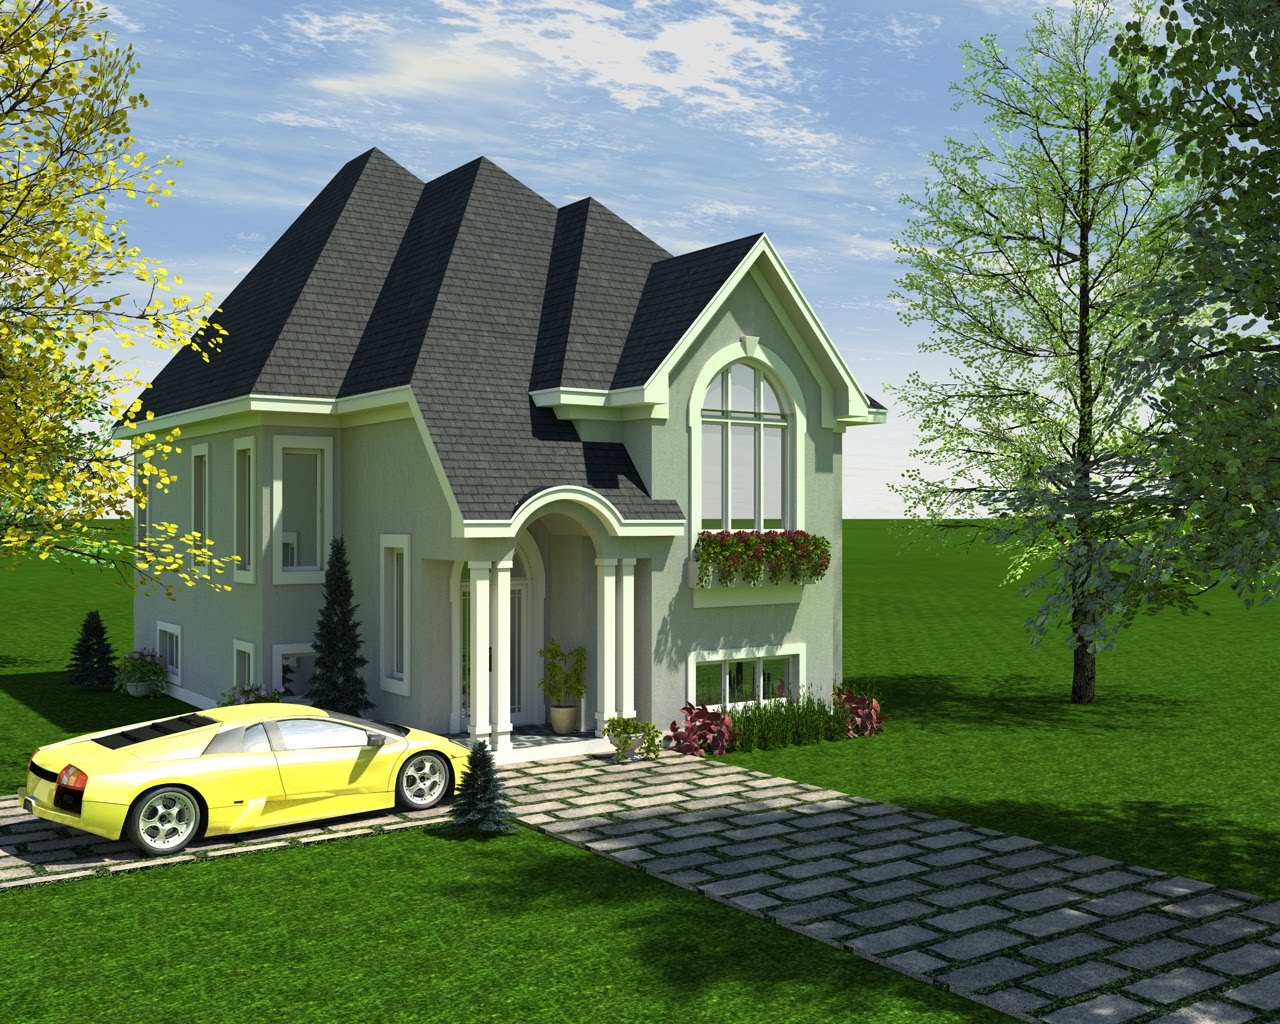 villetta americana : tree villetta television hotelzimmer design 2 477 casa tipo americana ...